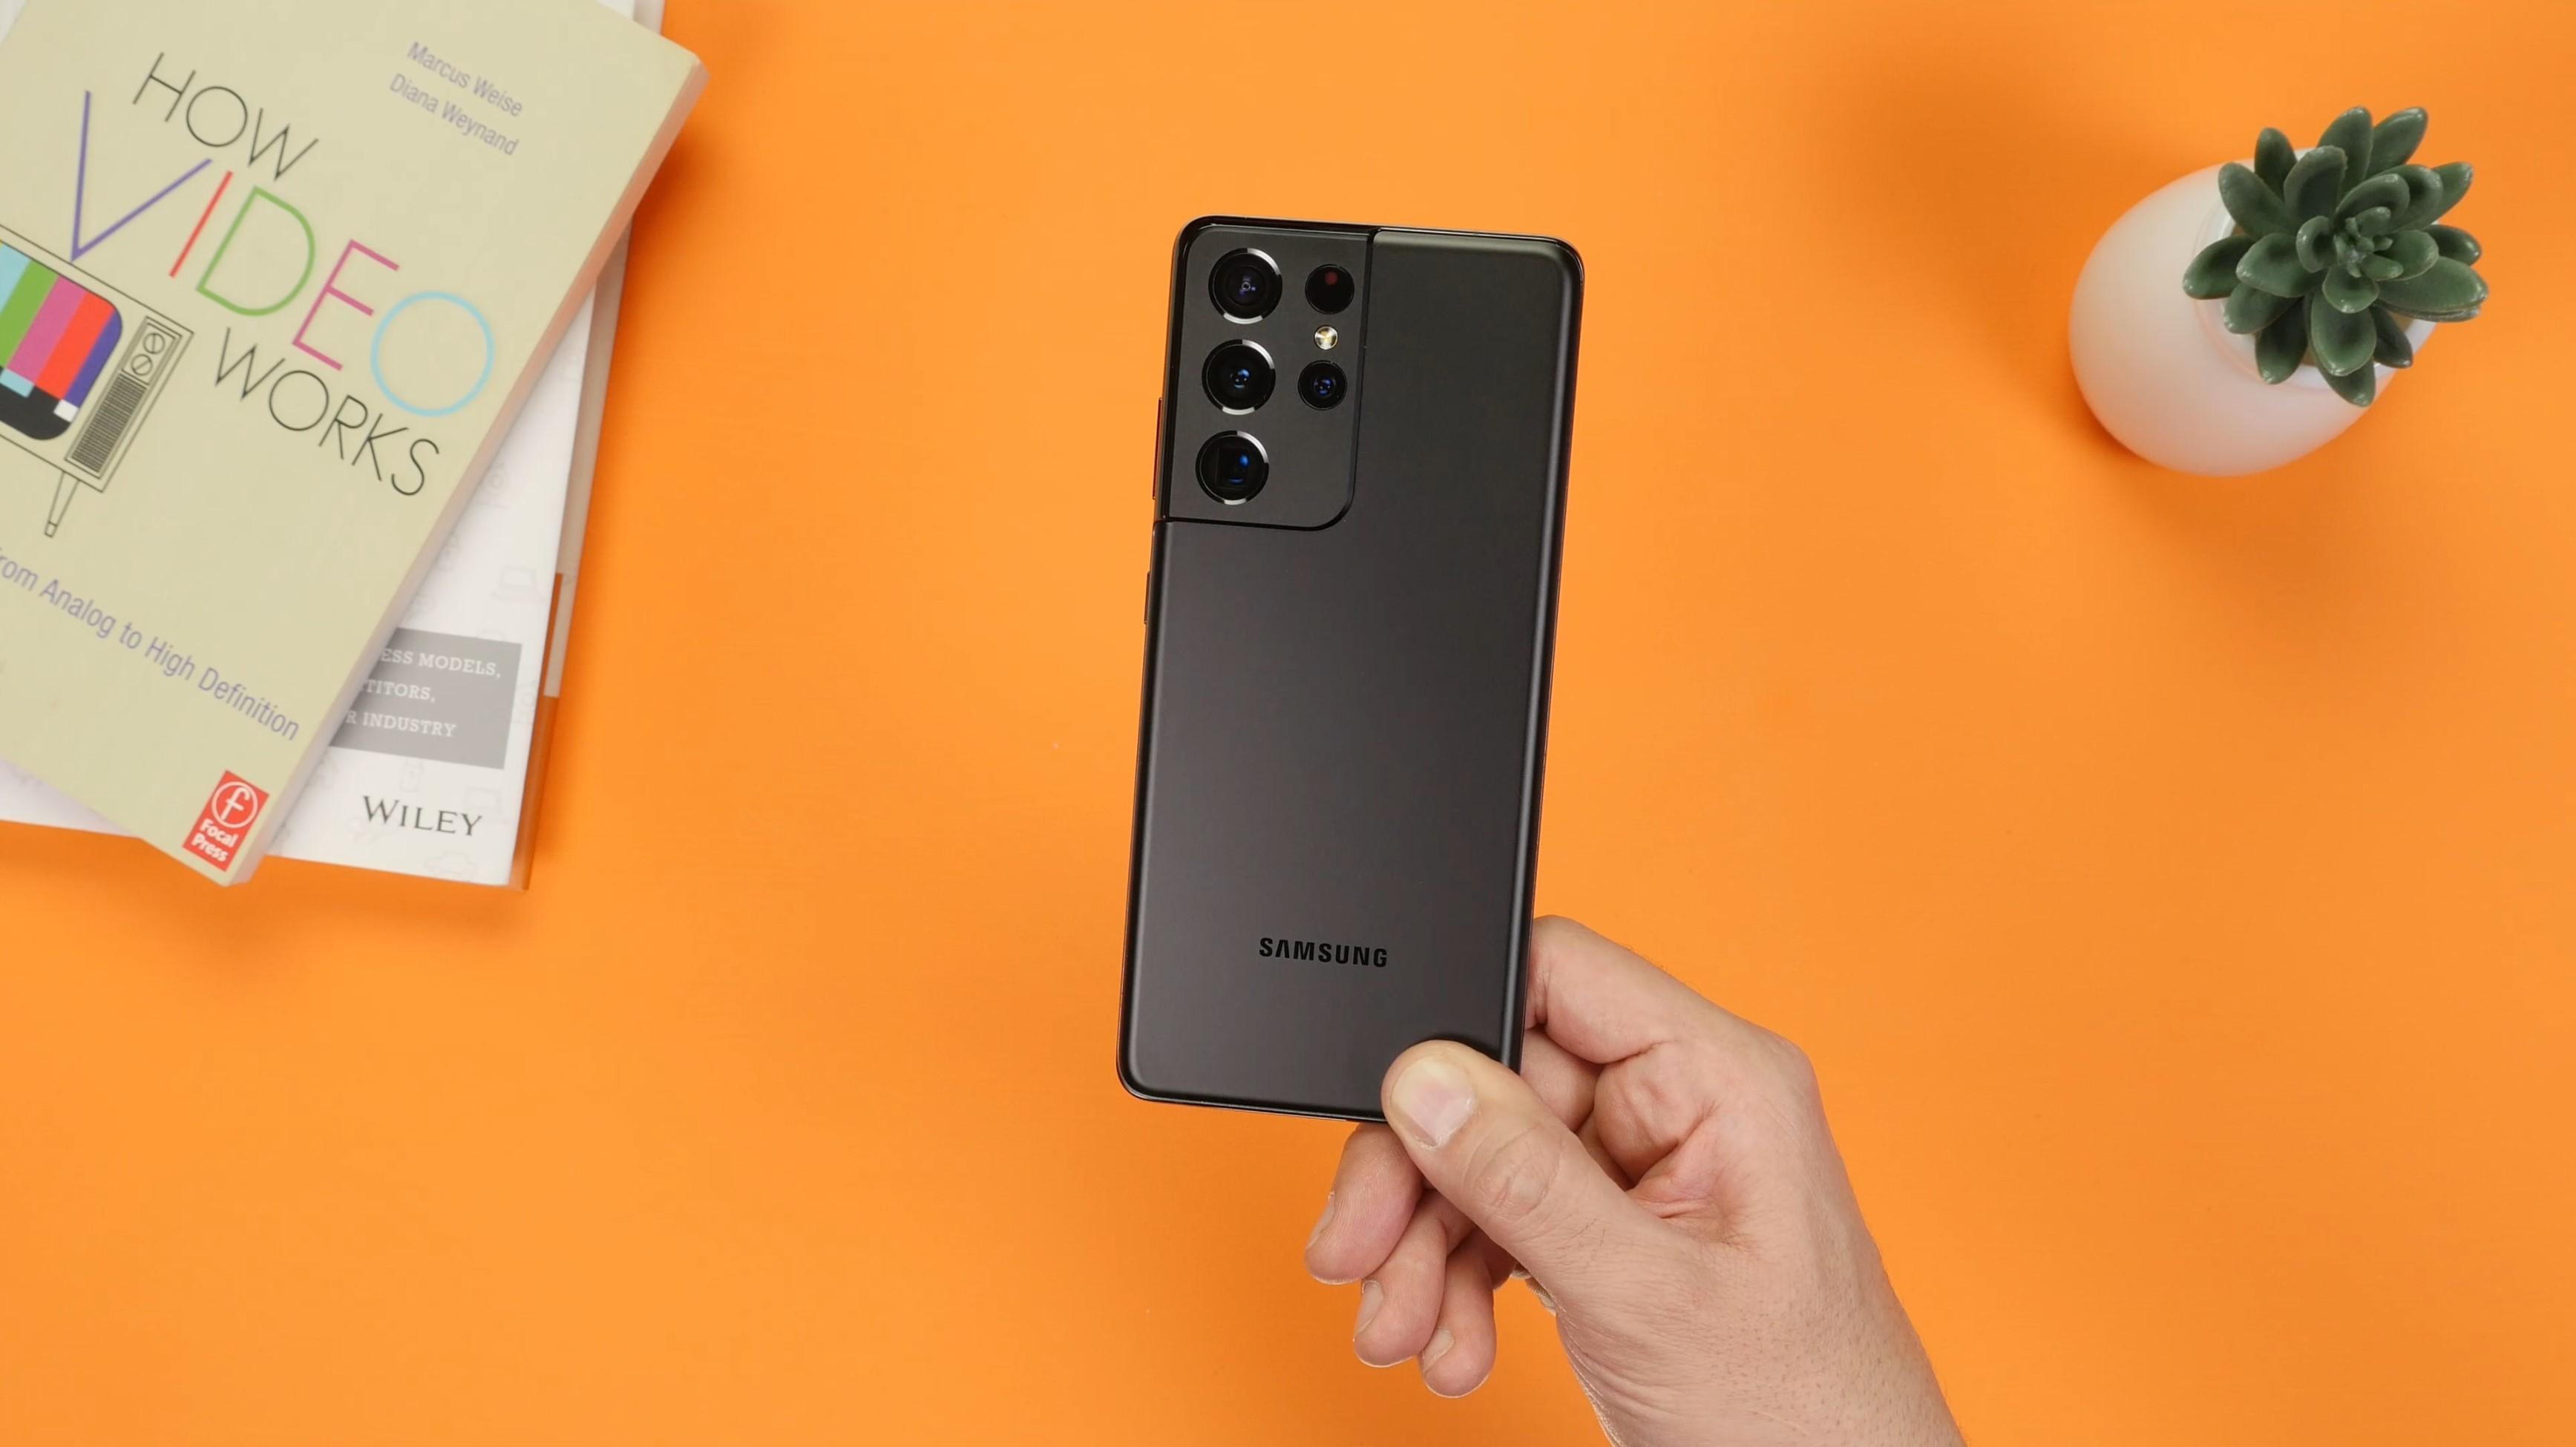 Samsung Galaxy S21 Ultra hands-on Techblog